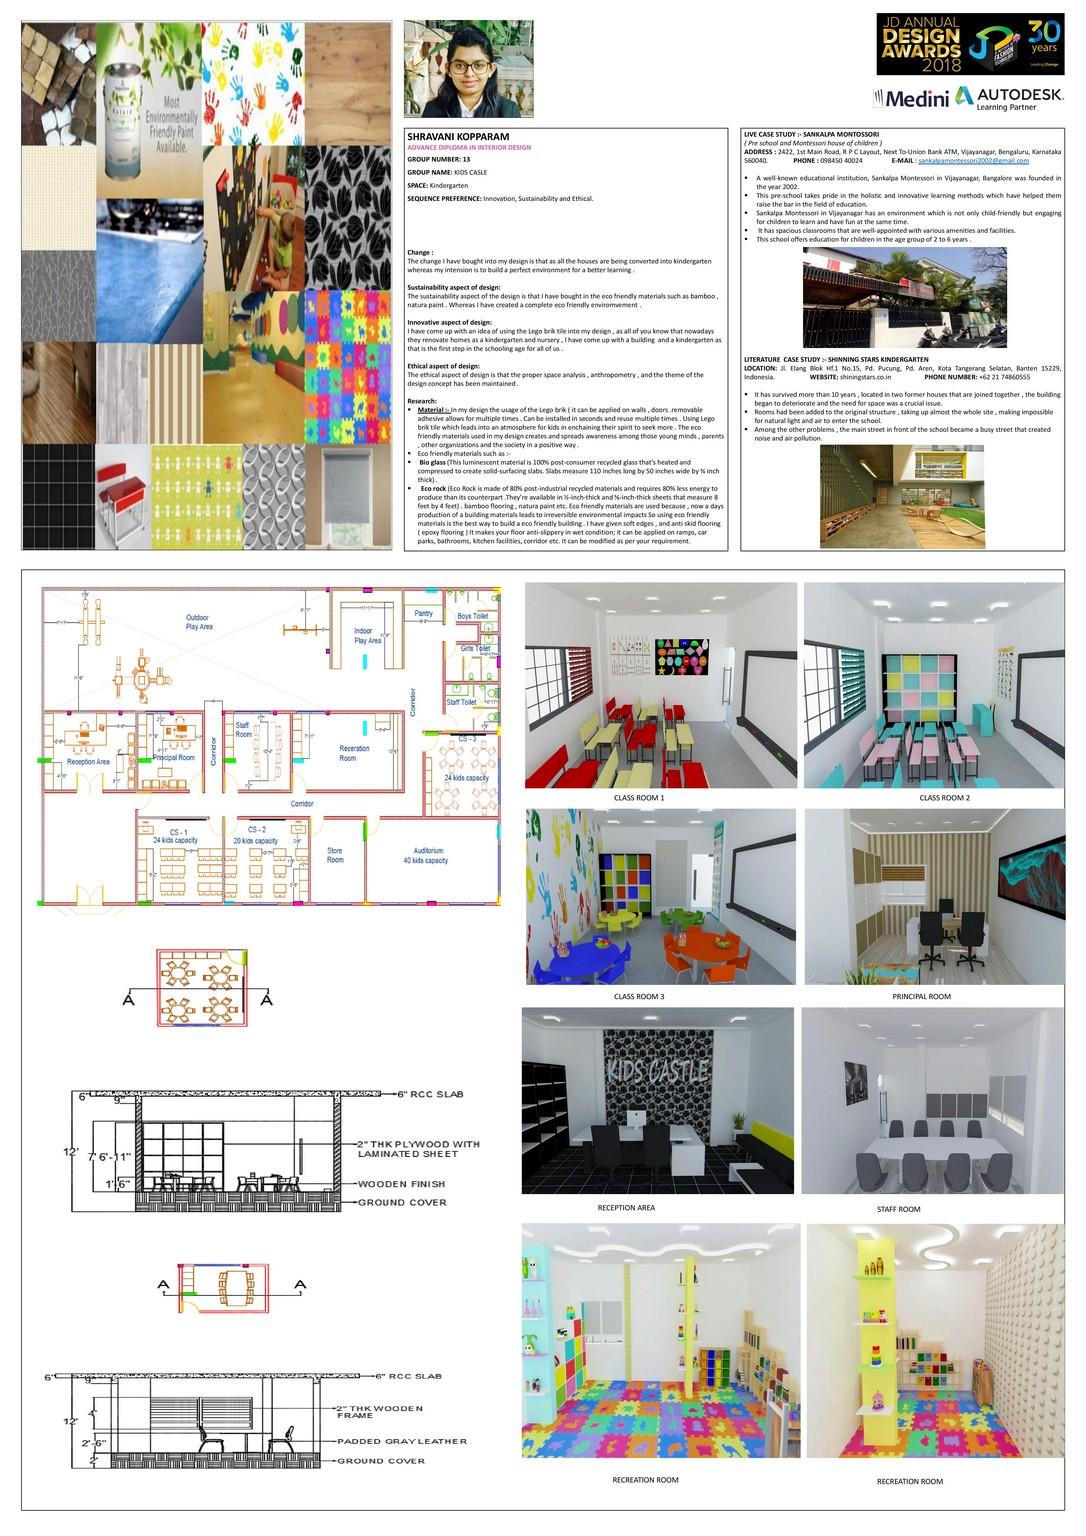 Kindergarten – Change – JD Annual Design Awards 2018   Designer: Shravani KV   Photography : Jerin Nath (@jerin_nath) kindergarten - kinder garten1 - Kindergarten – Change – JD Annual Design Awards 2018